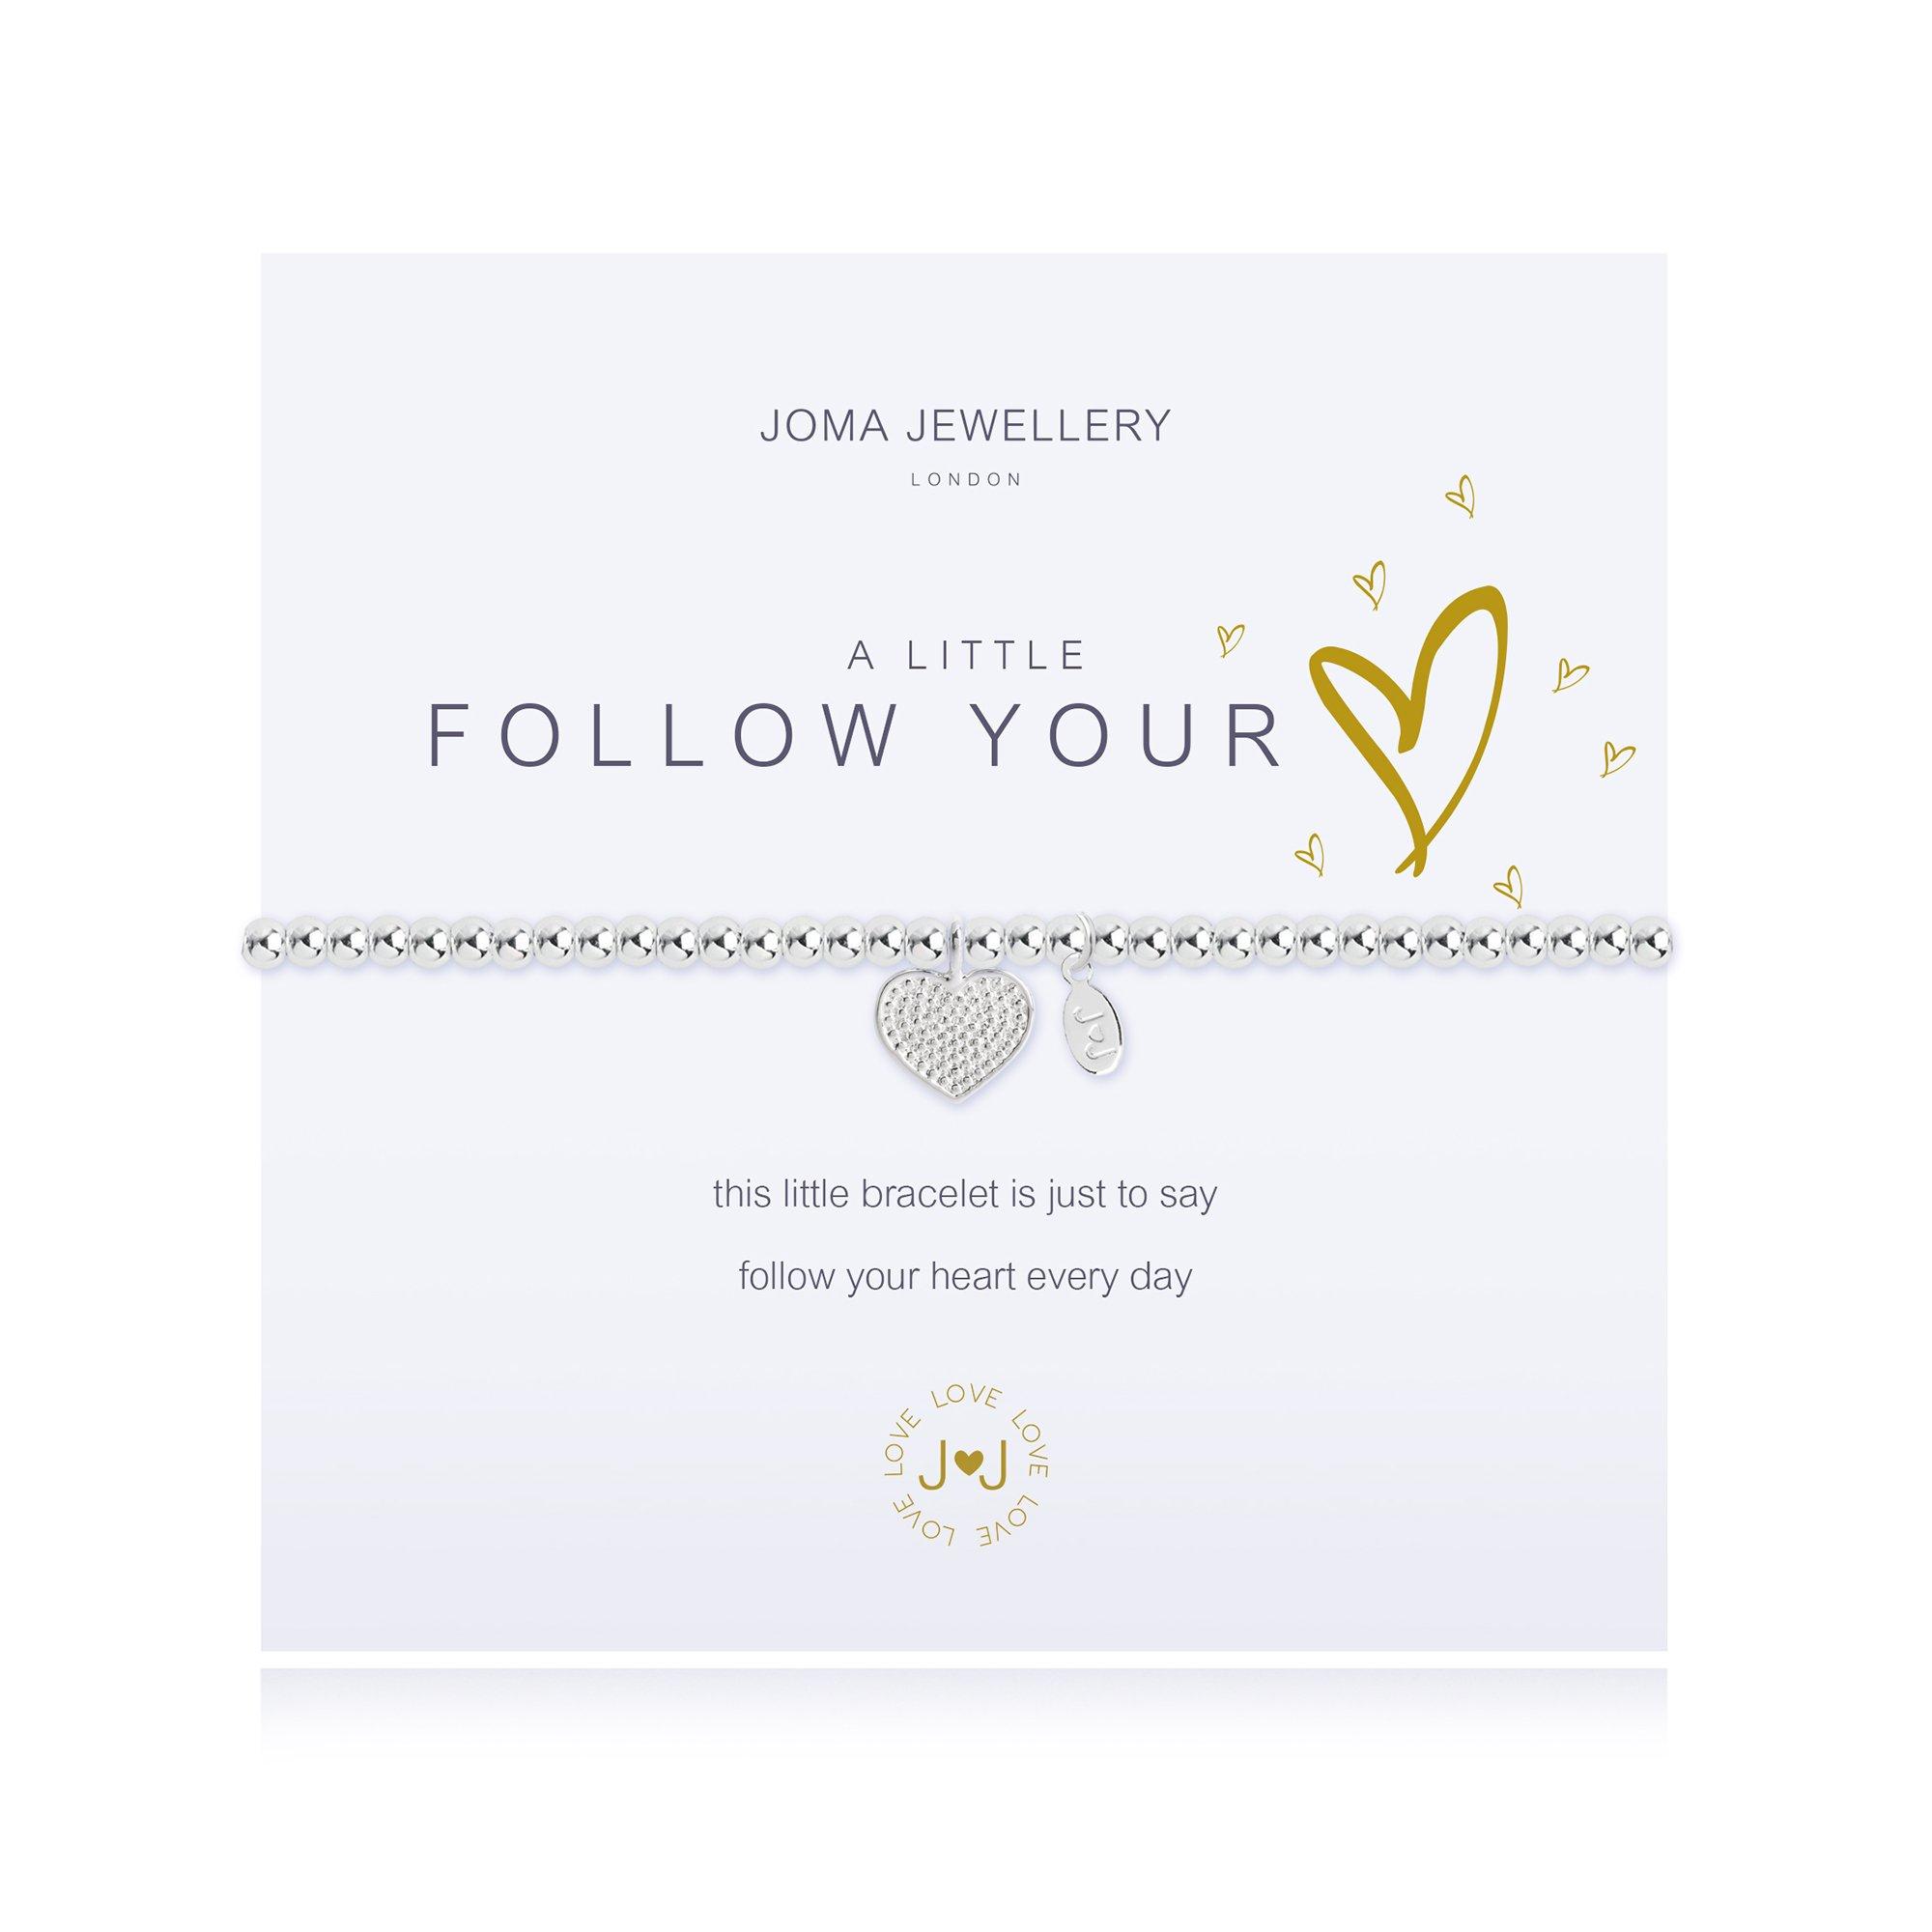 Joma Jewellery Bracelet - Follow your Heart